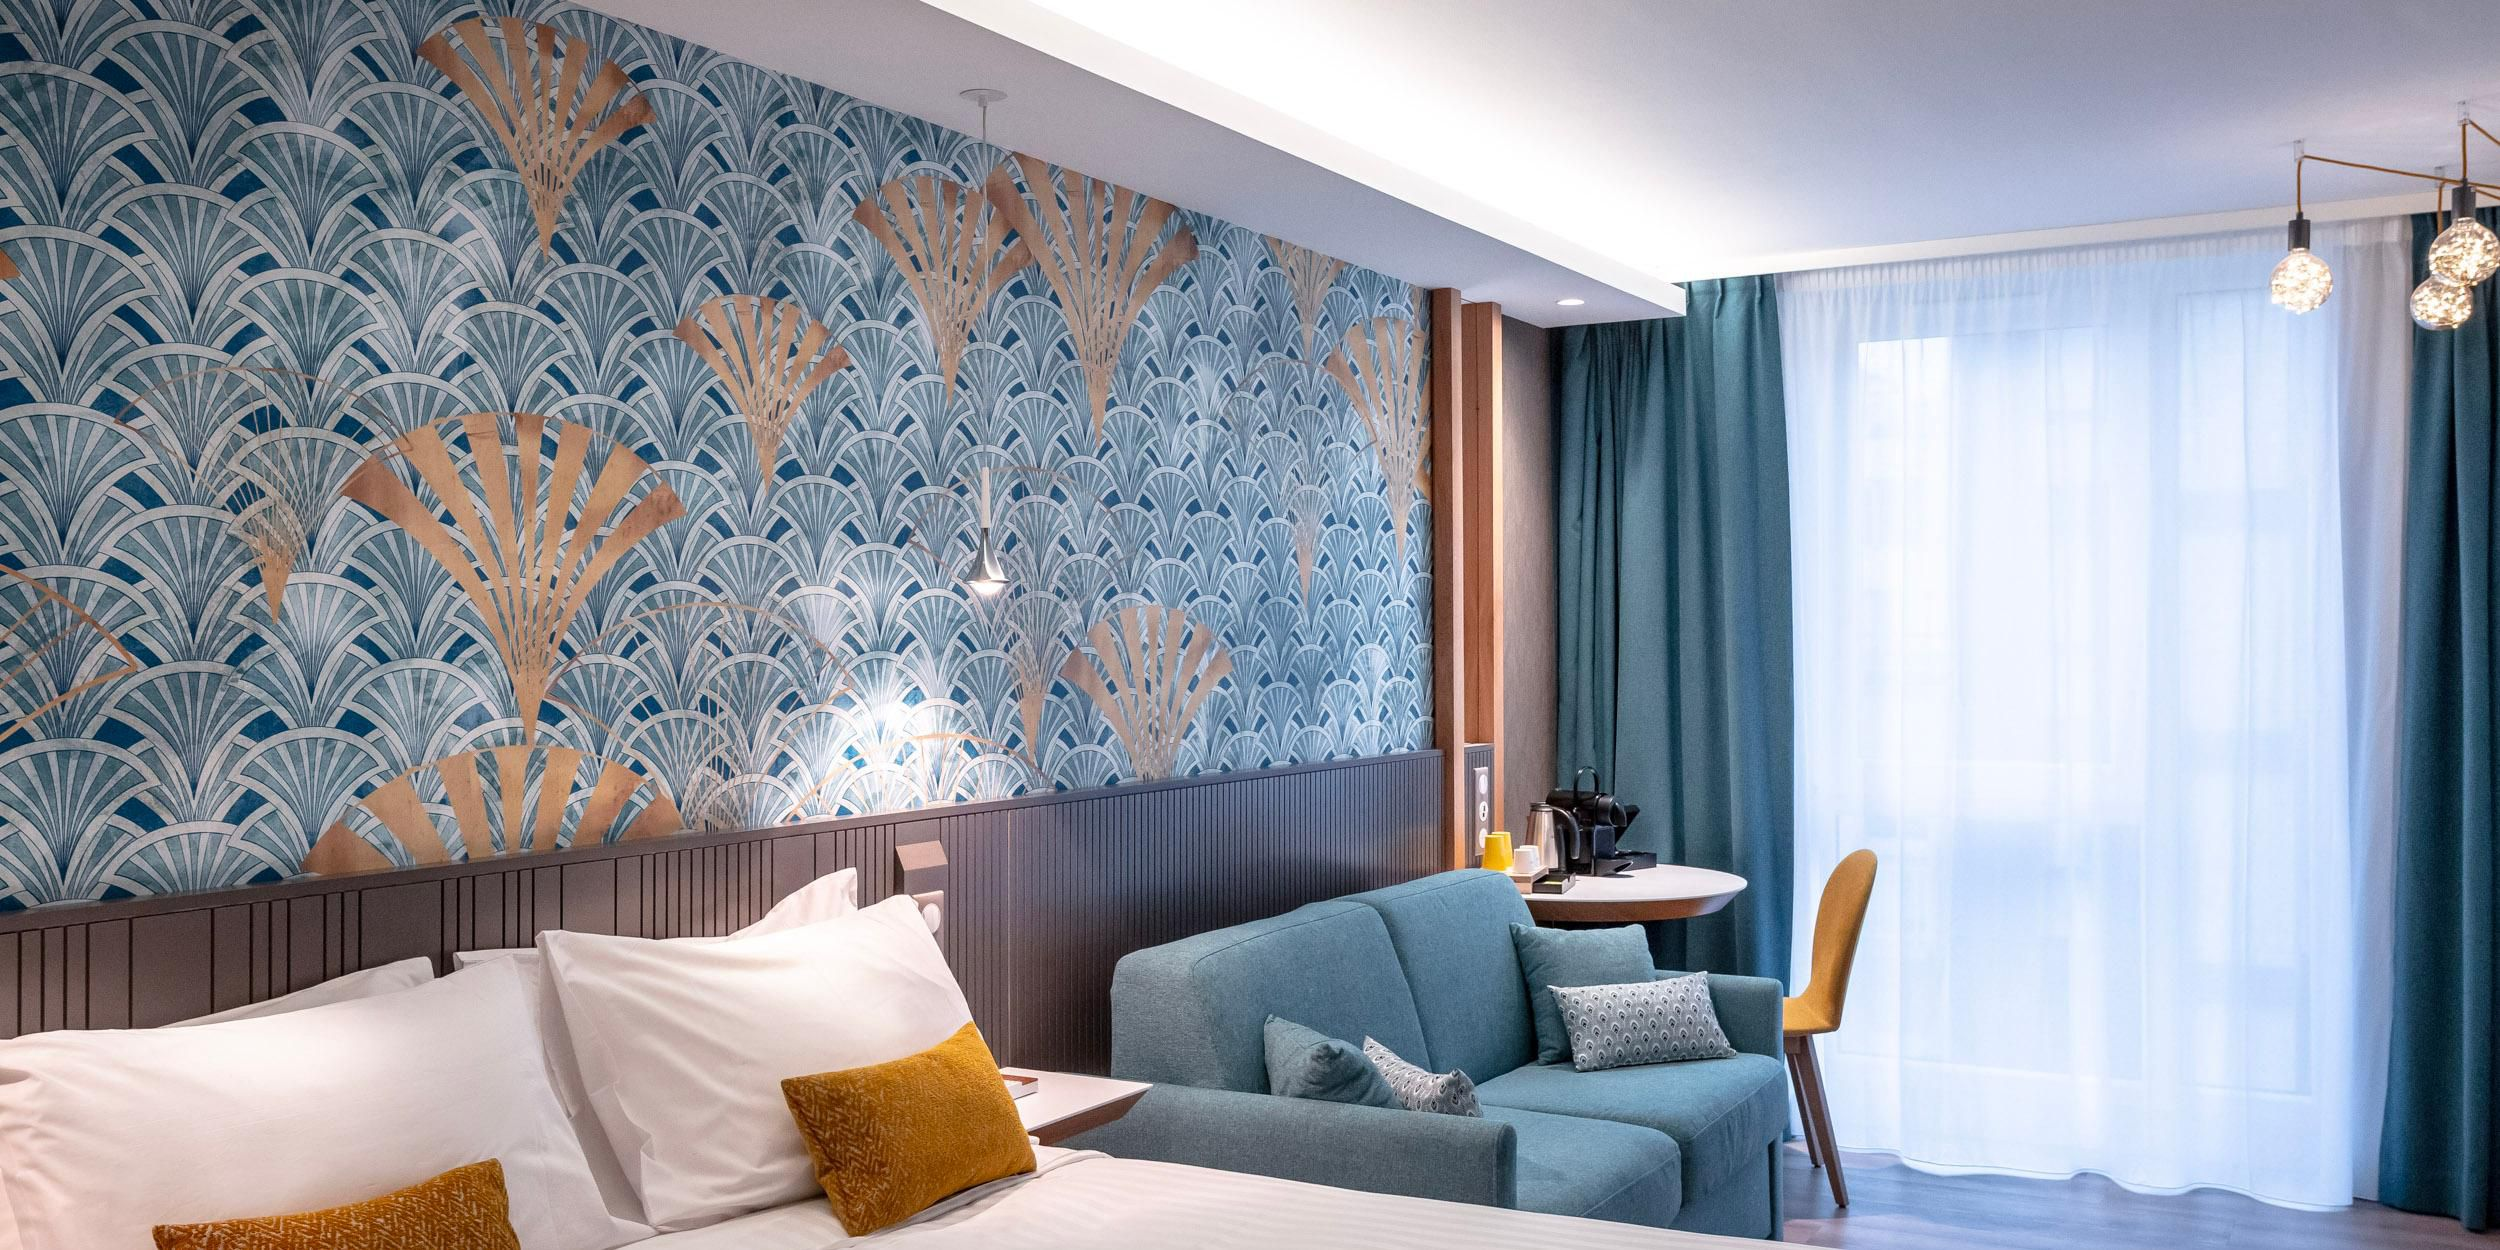 1 Queen Bed premium room with sofa Bed